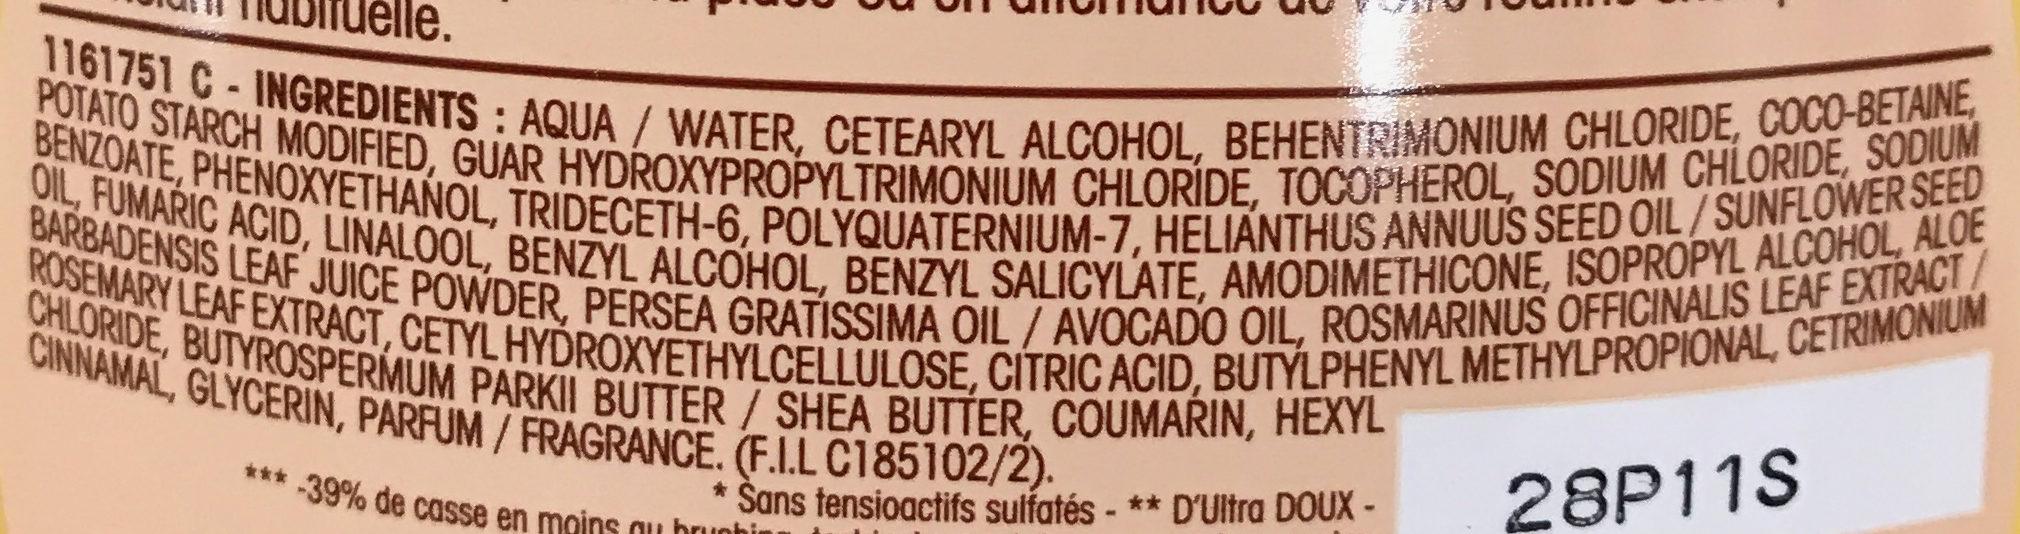 Ultra Doux Le Low Shampoo - Ingredients - fr